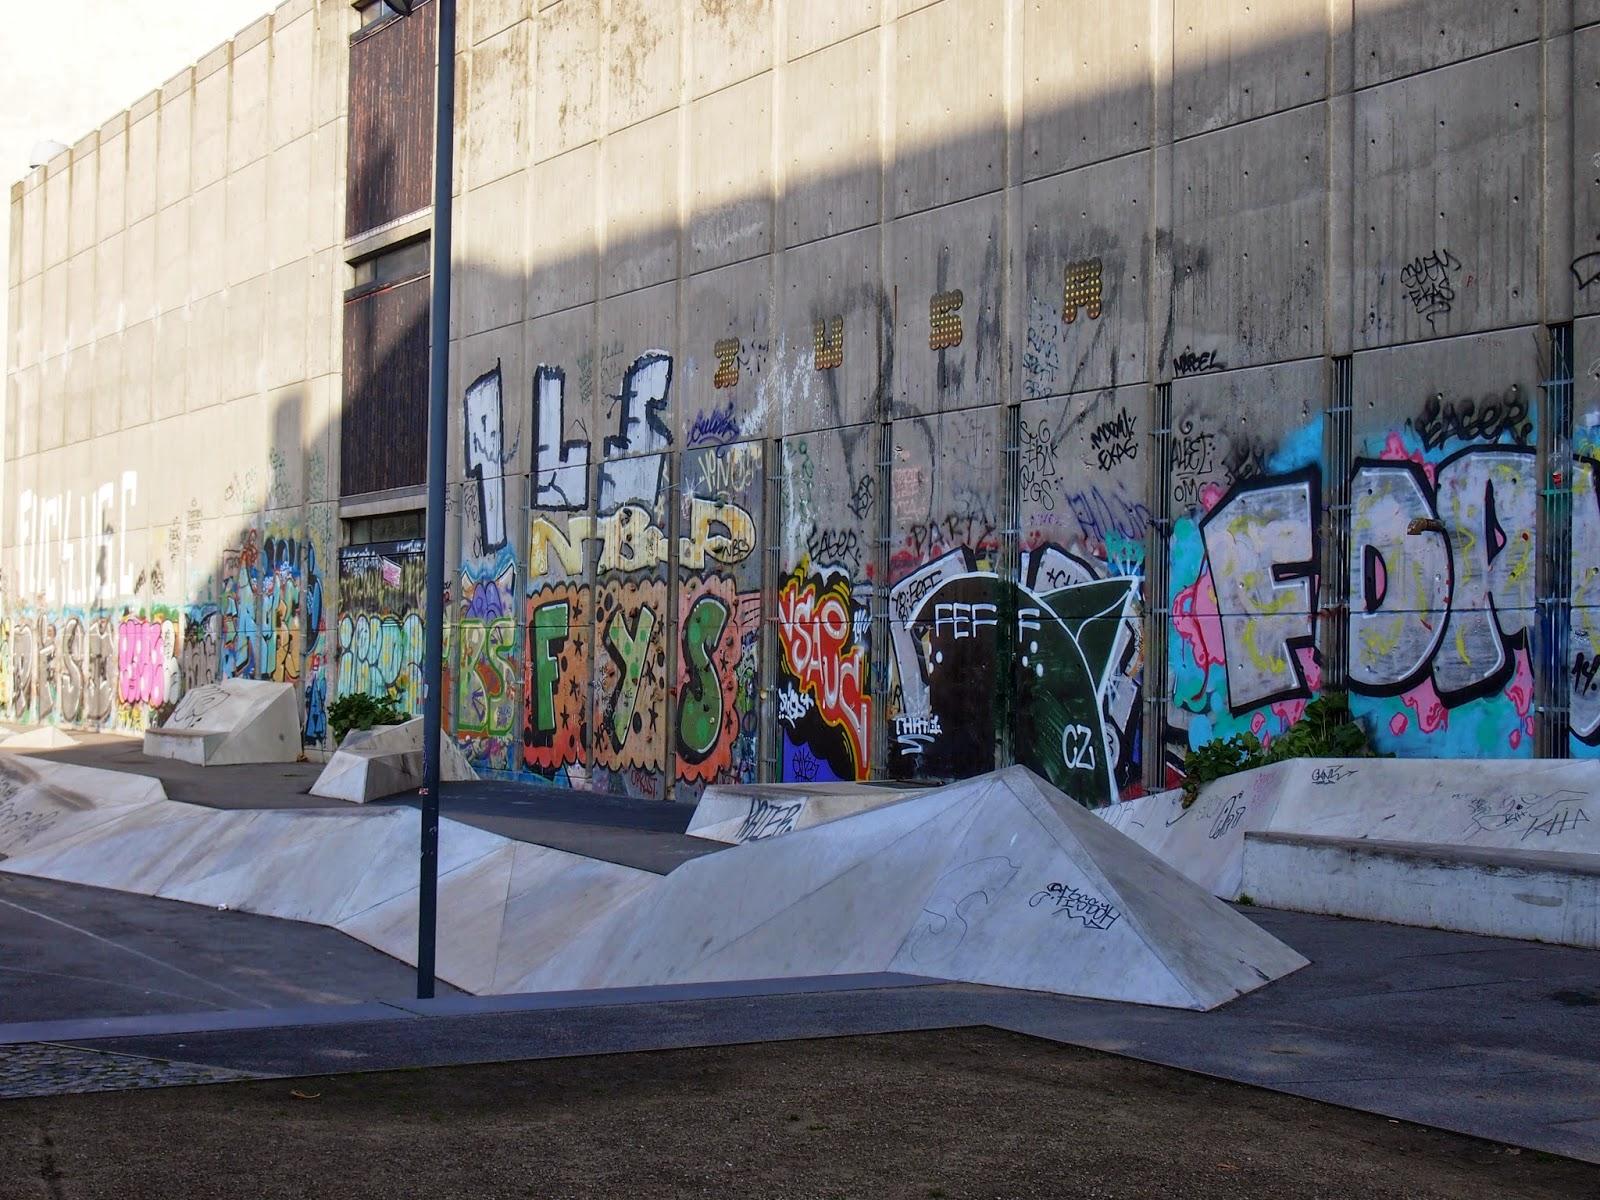 street art in a skate park in copenhagen